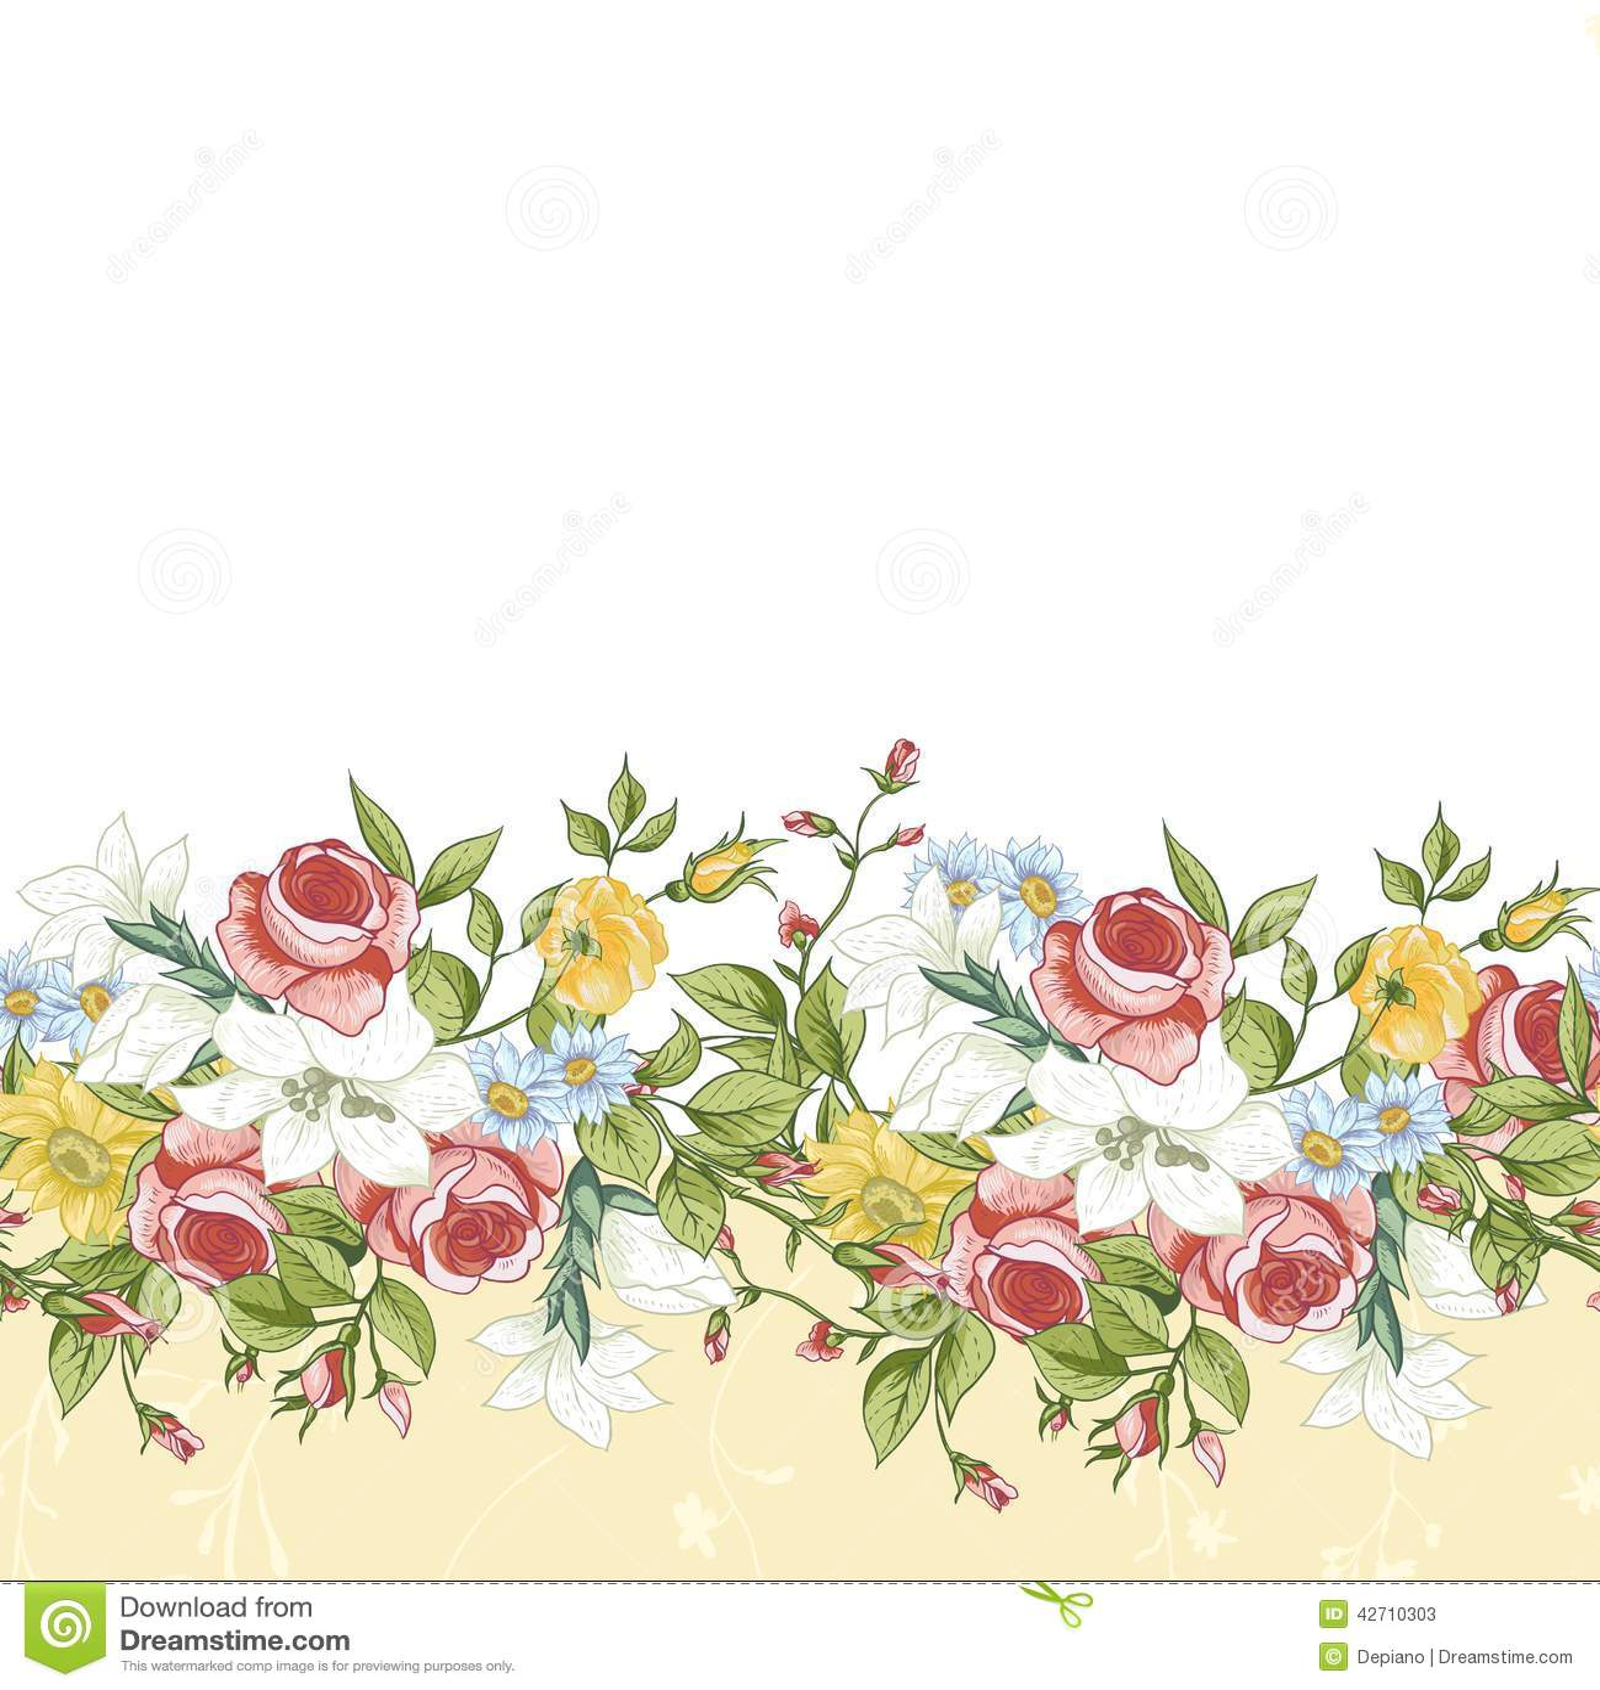 Flower border designs for cards seamless floral border m4hsunfo